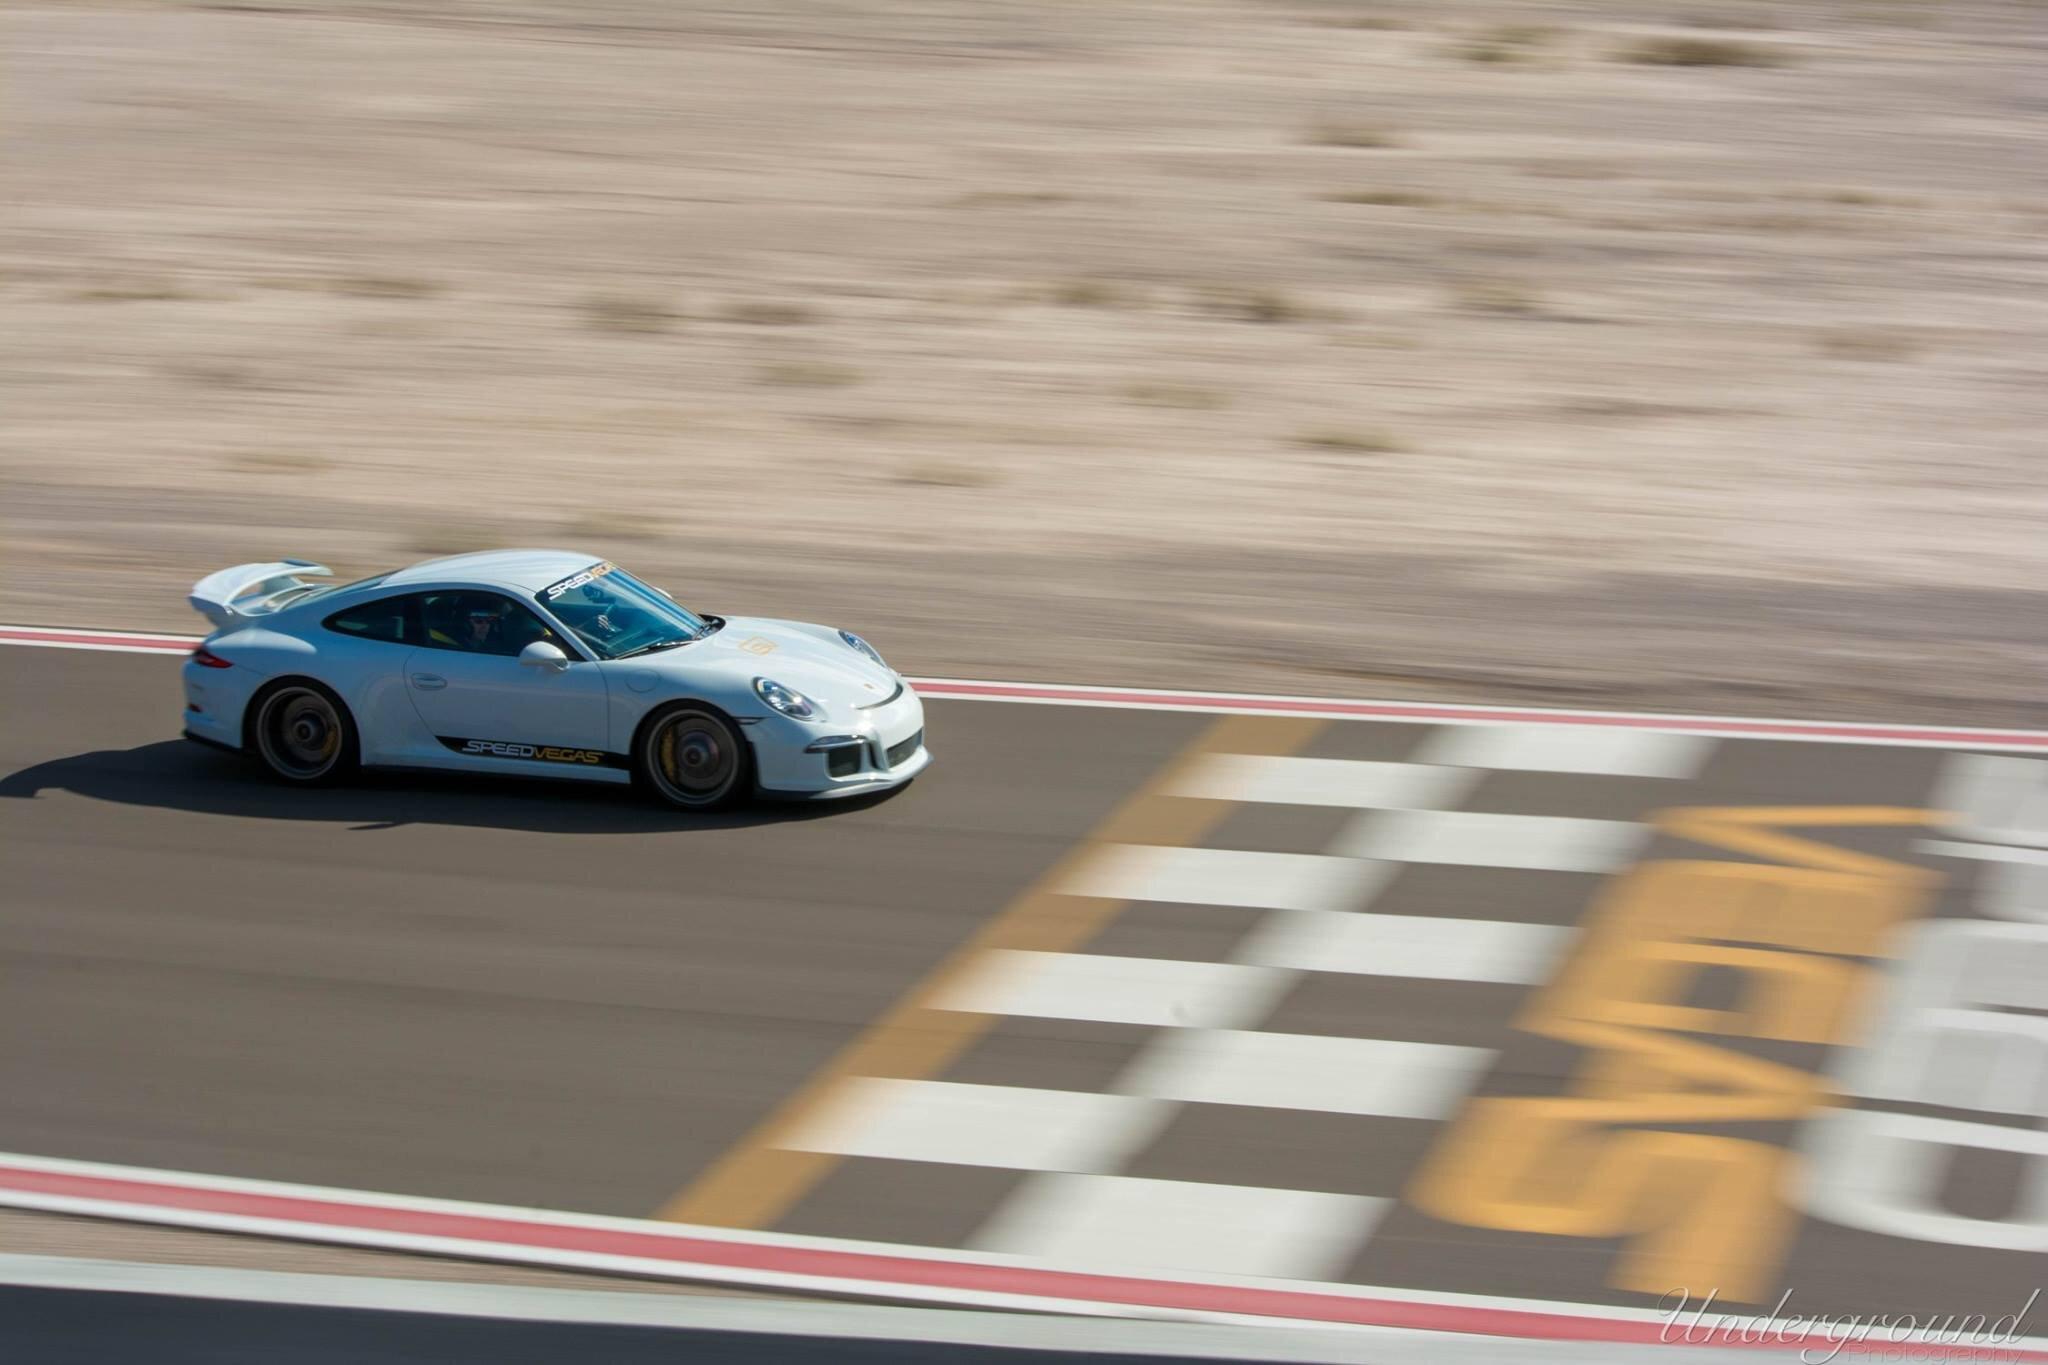 shane racing.jpg